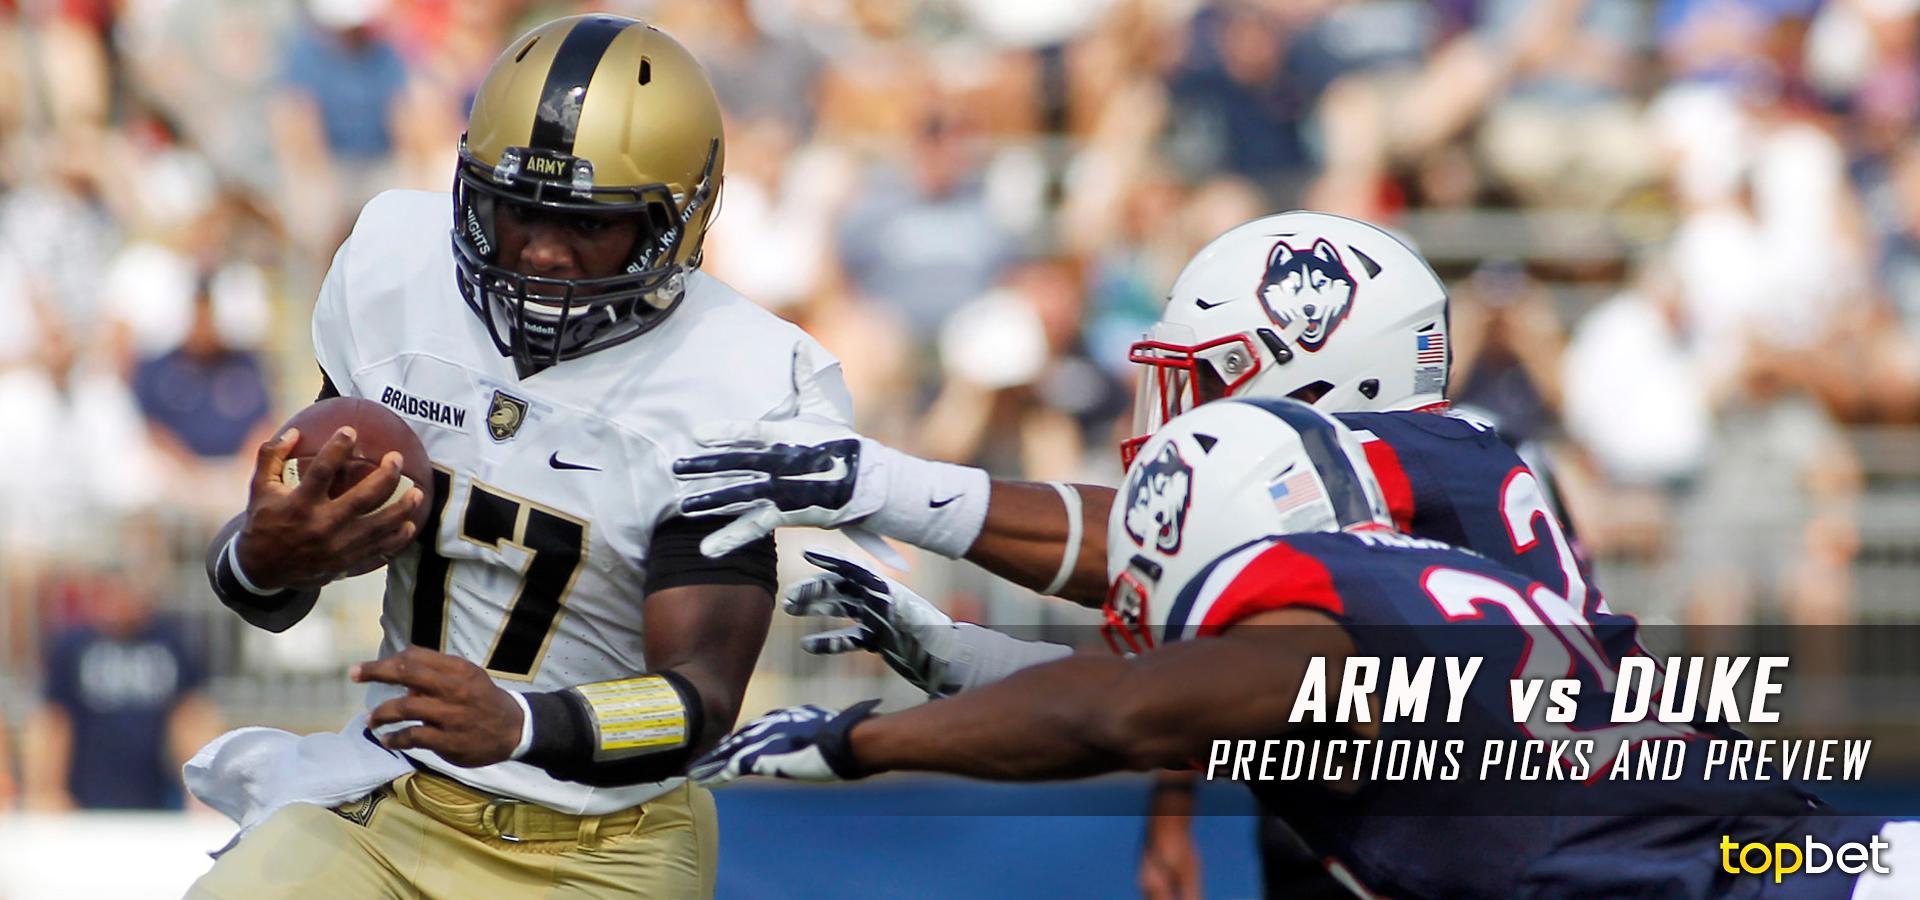 Army vs Duke Football Predictions and Picks